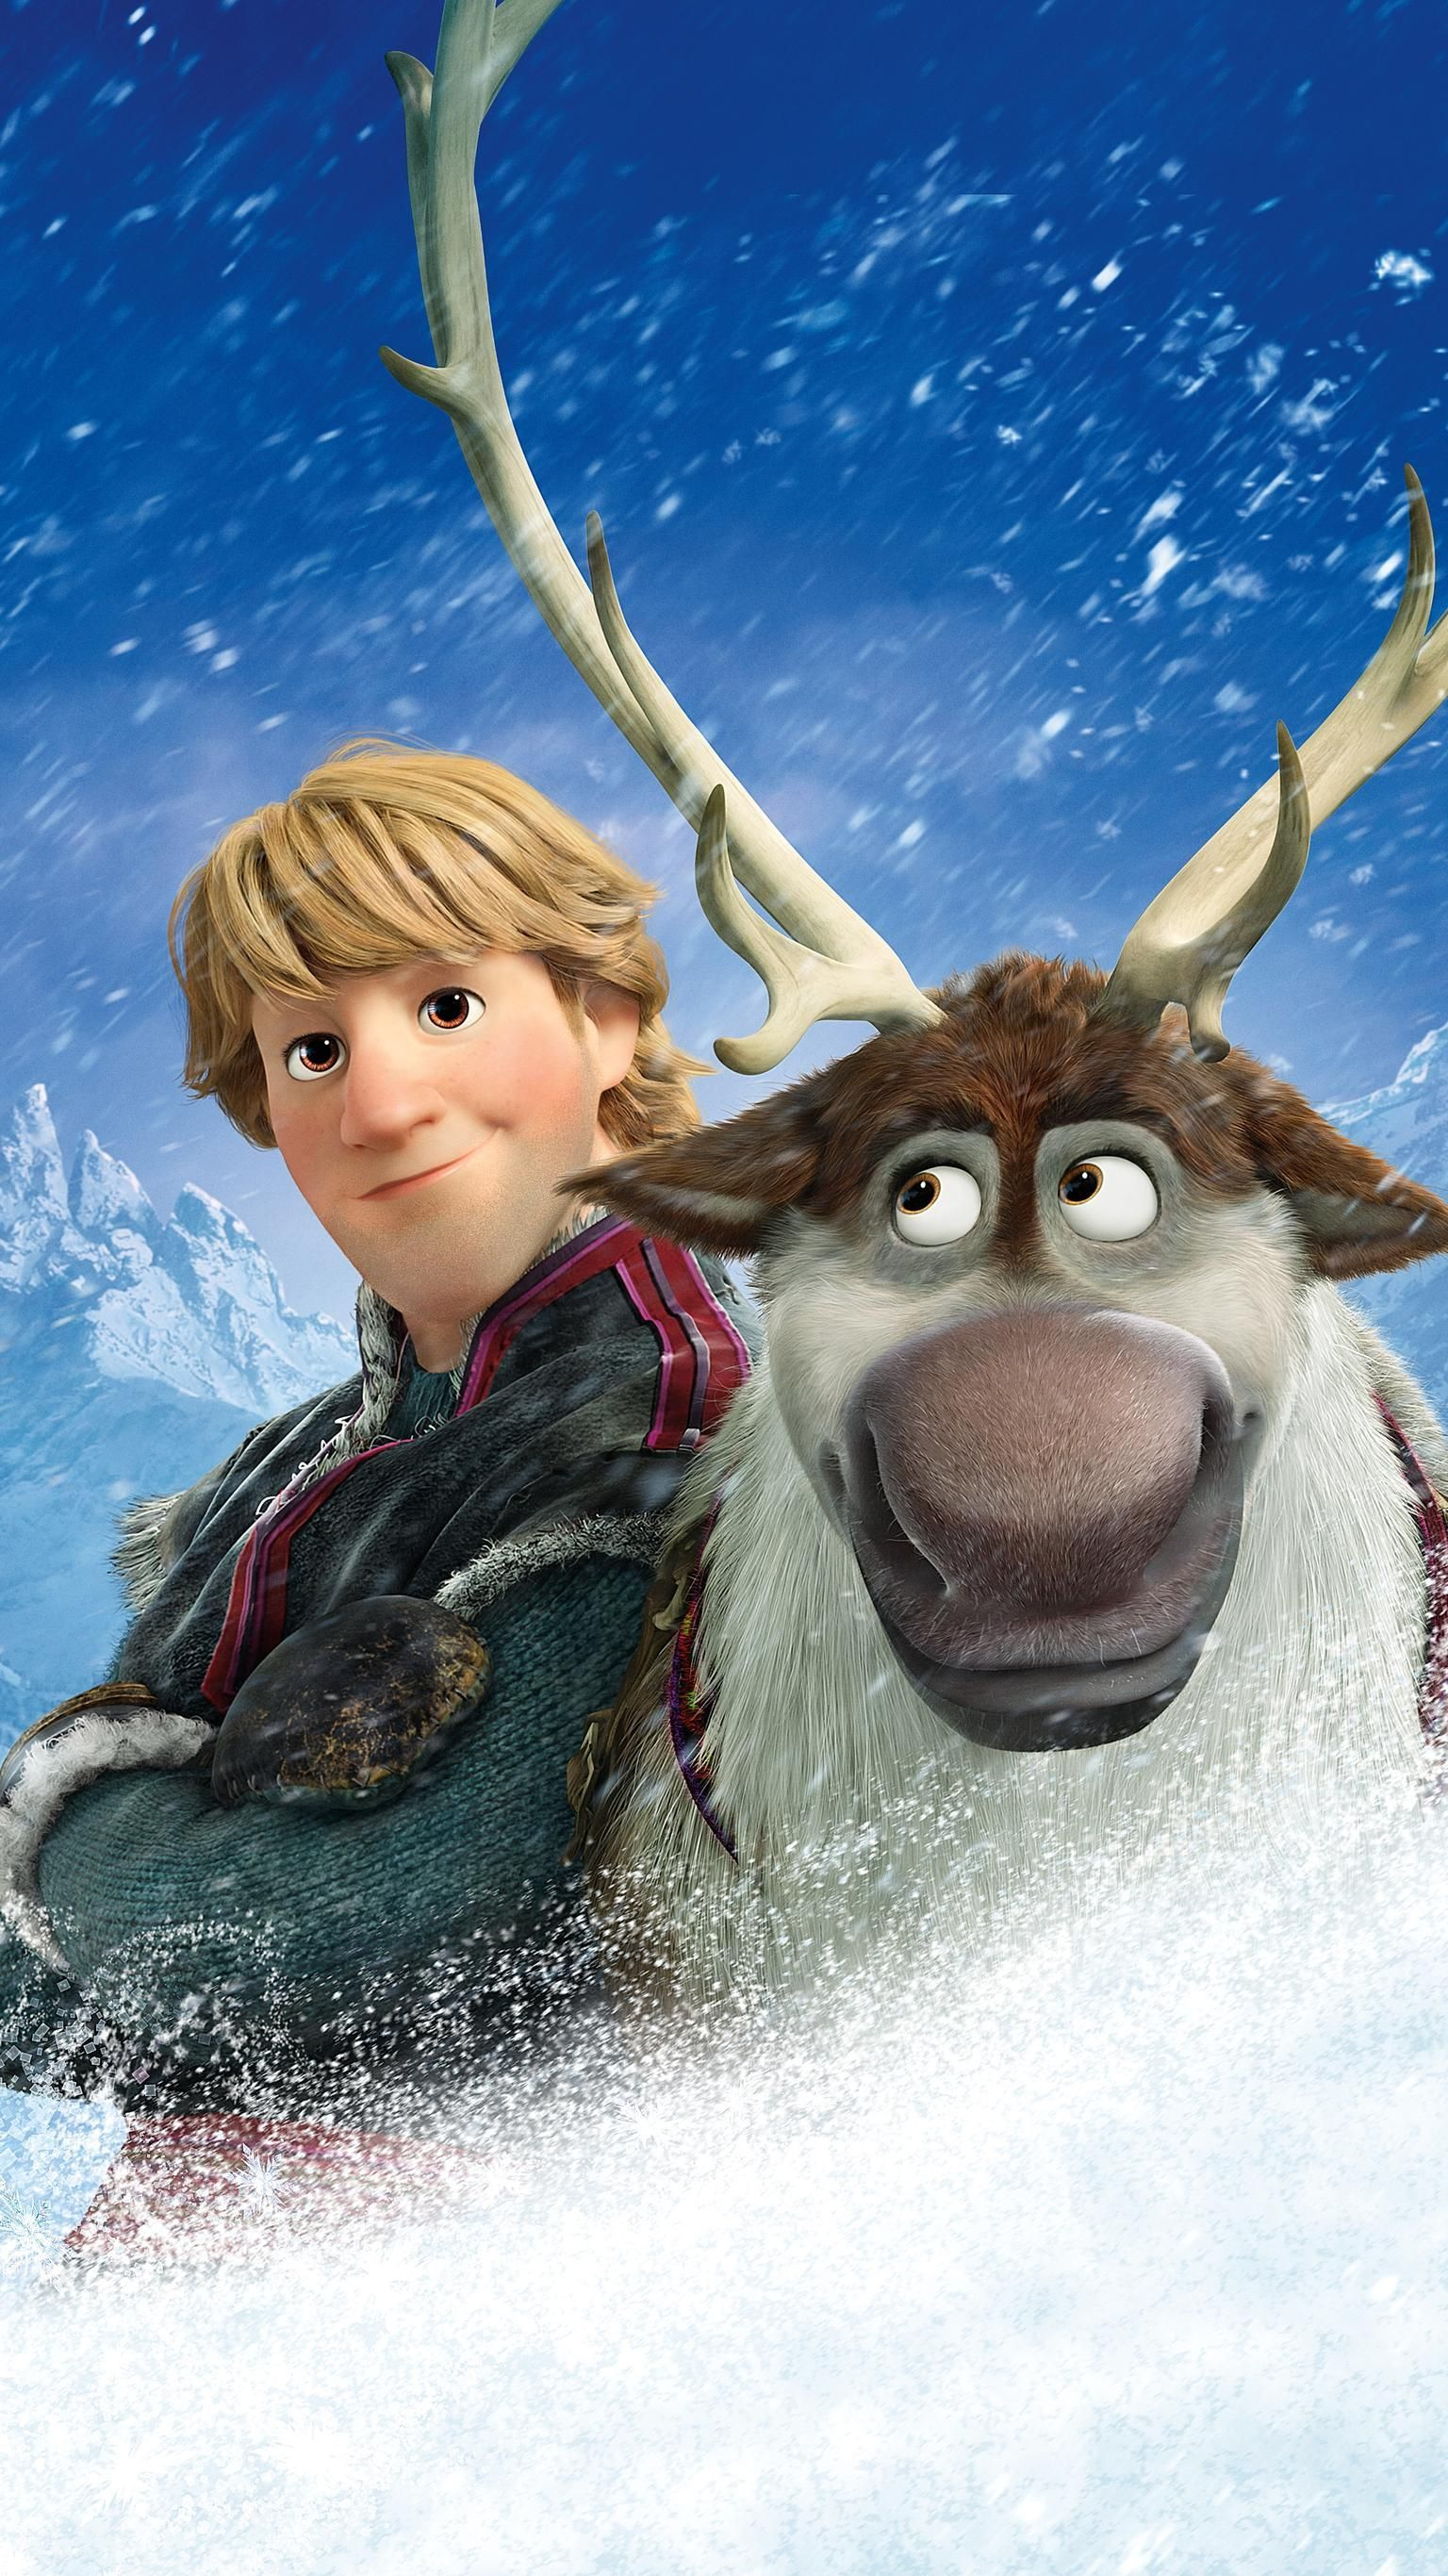 Pin De Jenniffer Ordoñez En Cumple Samarha En 2020 Frozen Personajes Fondo De Pantalla De Frozen Frozen Disney